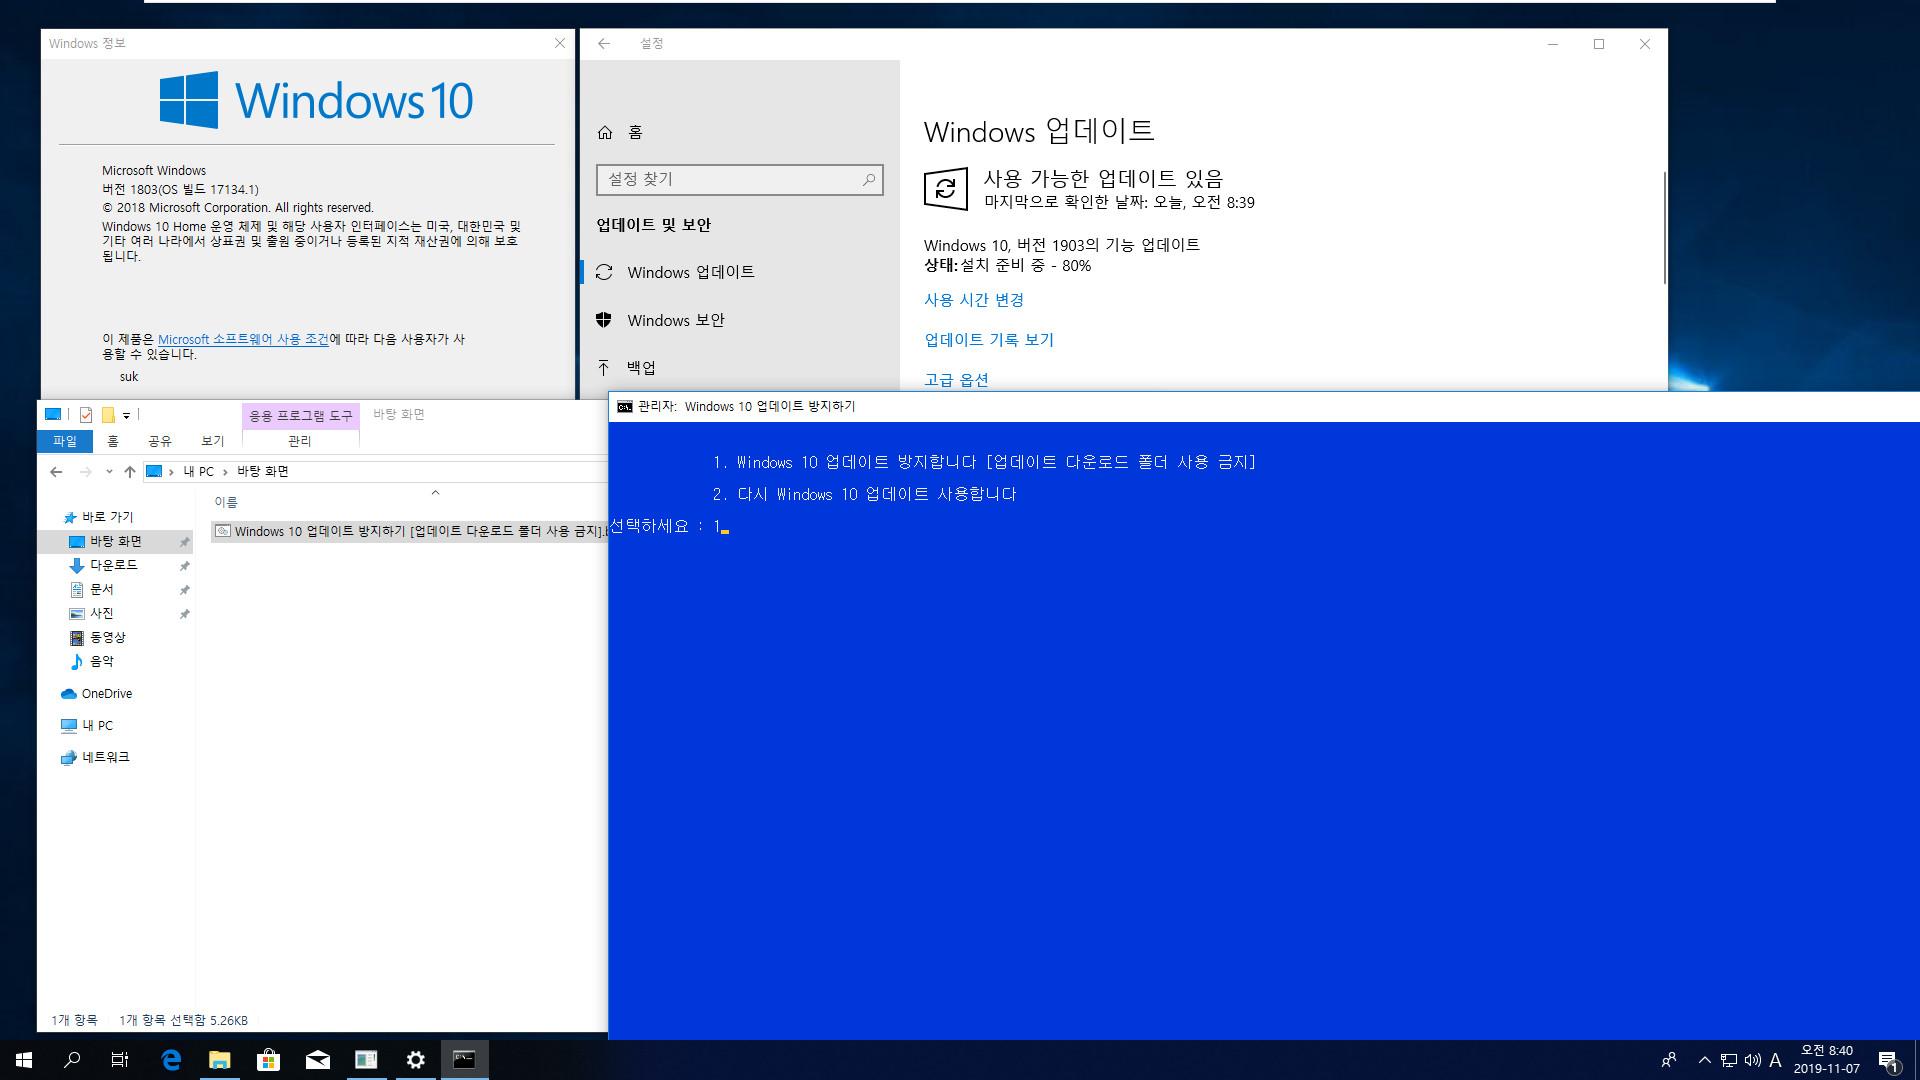 Windows 10 업데이트 방지하기 [업데이트 다운로드 폴더 사용 금지].bat 테스트 - 버전 1803, Home 에서 버전 1903 기능 업데이트 방지하기 2019-11-07_084029.jpg